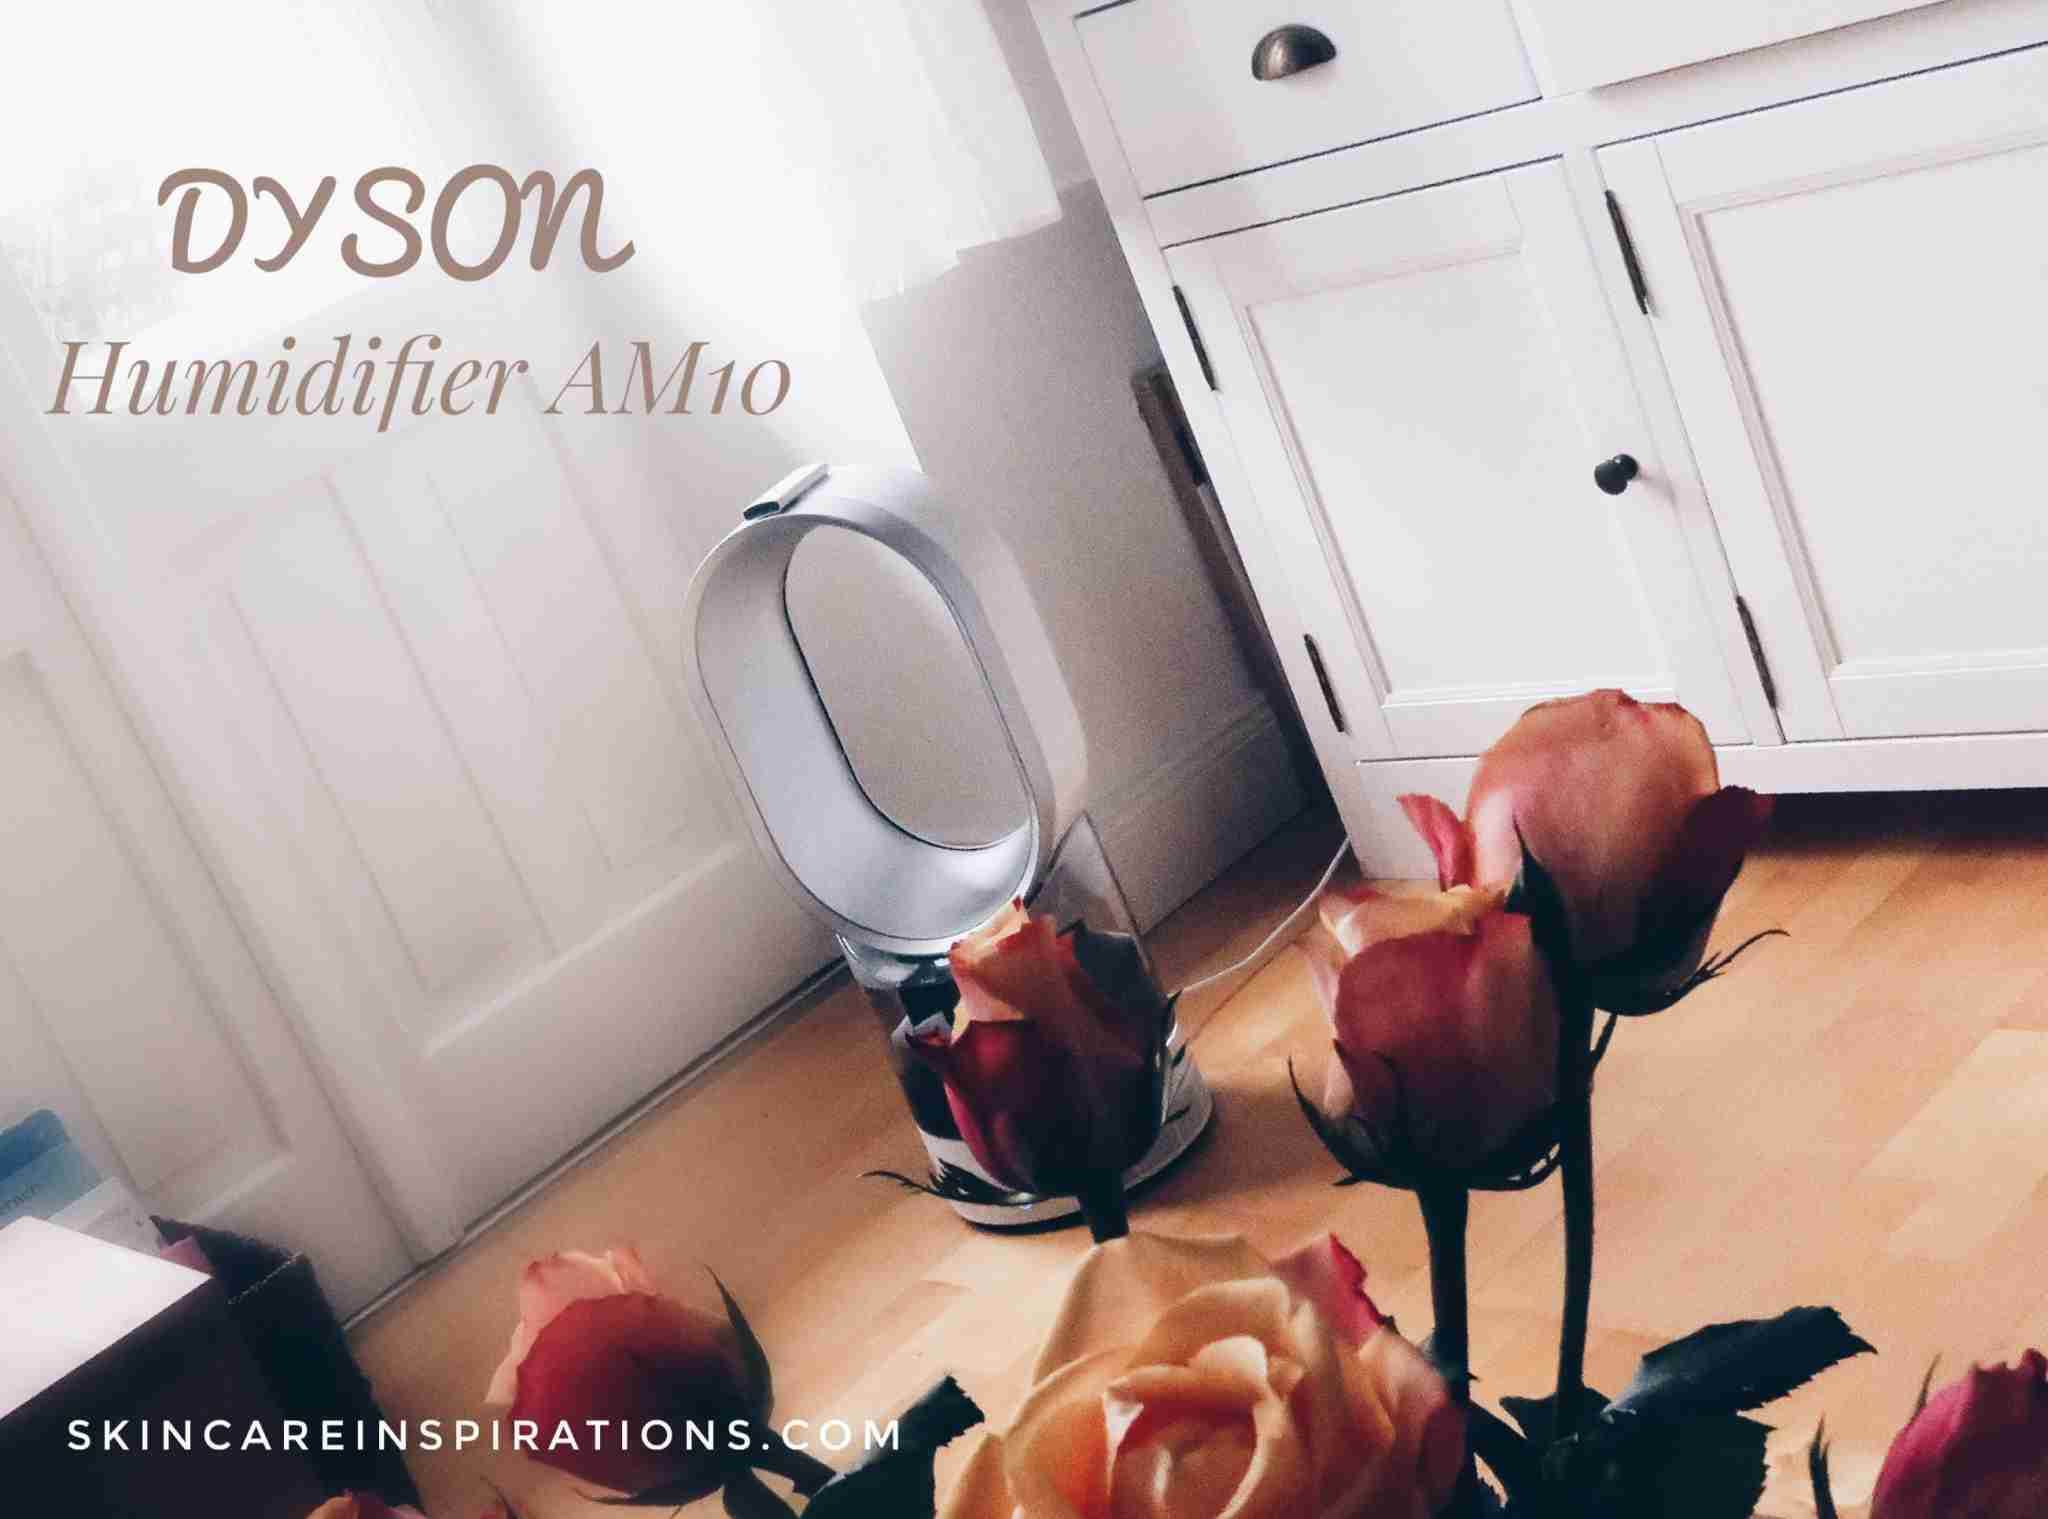 Dyson Humidifier Hautpflege AM10 -2 copy